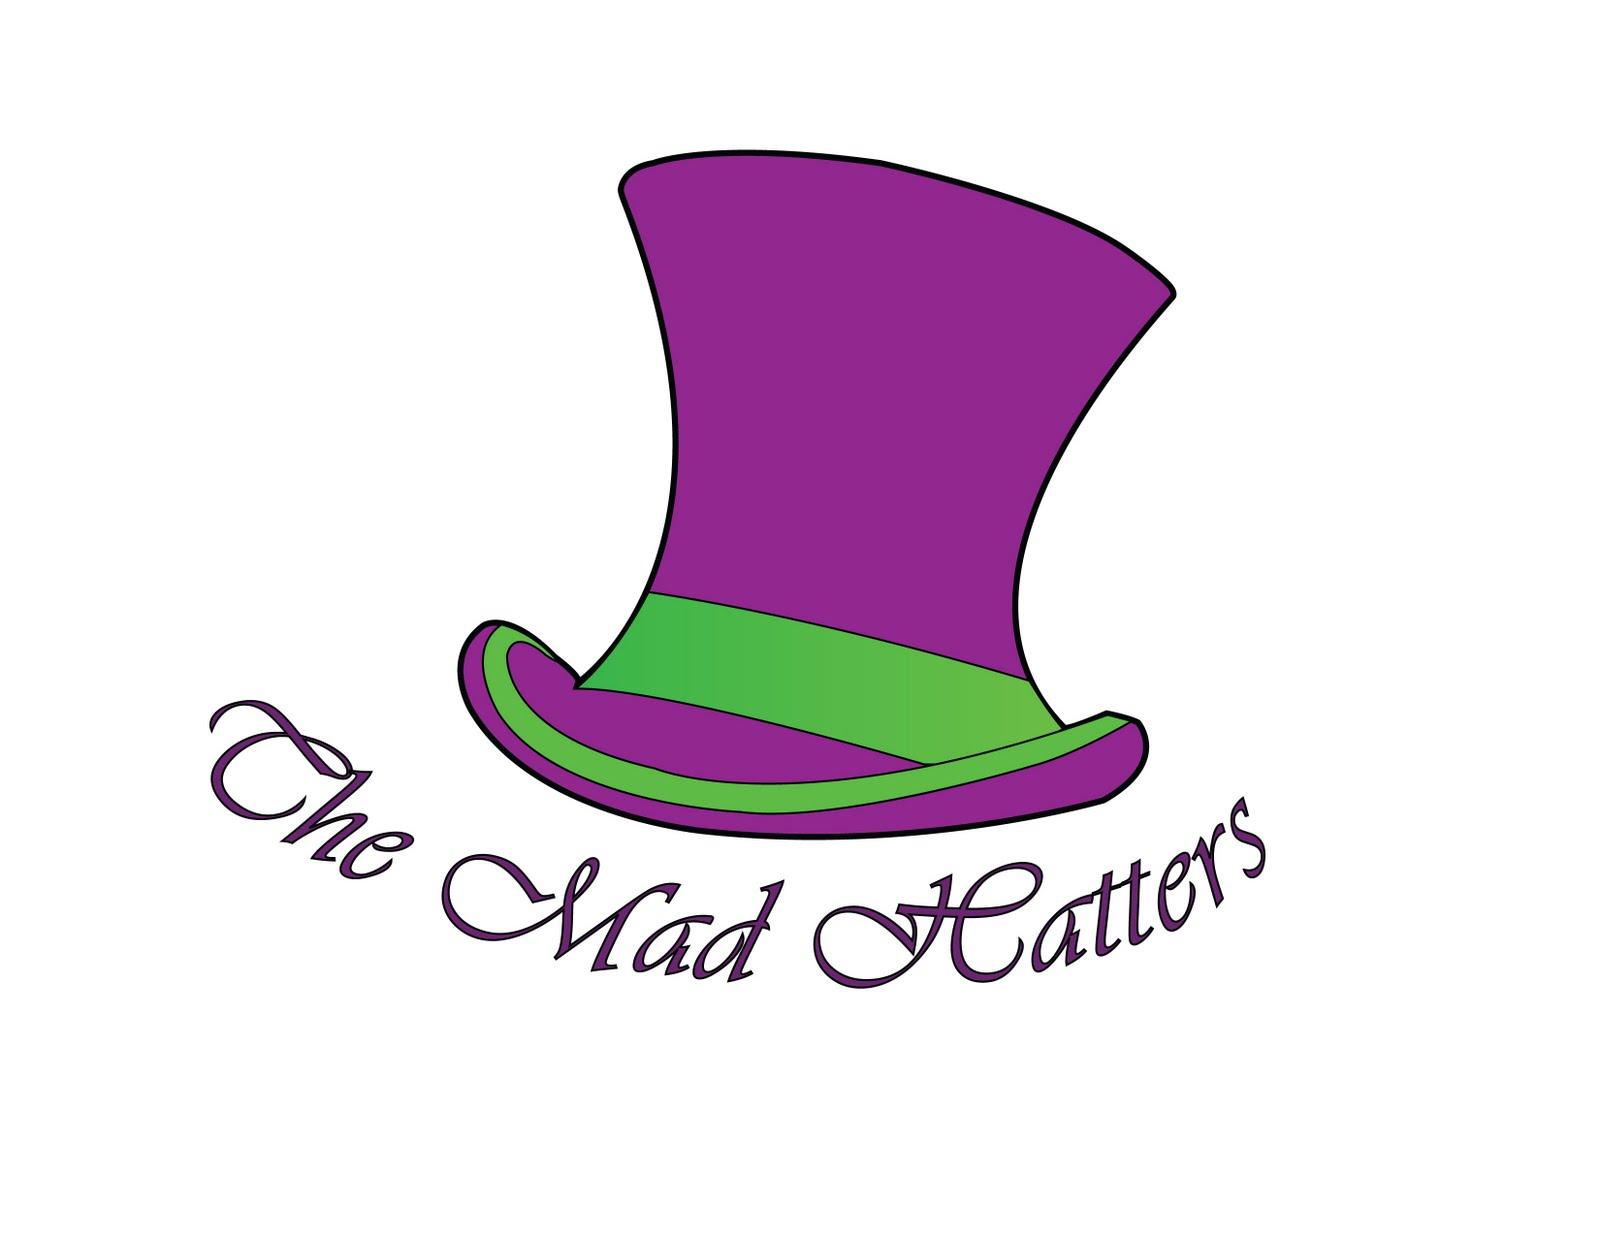 adventures in wonderland new mad hatters logo